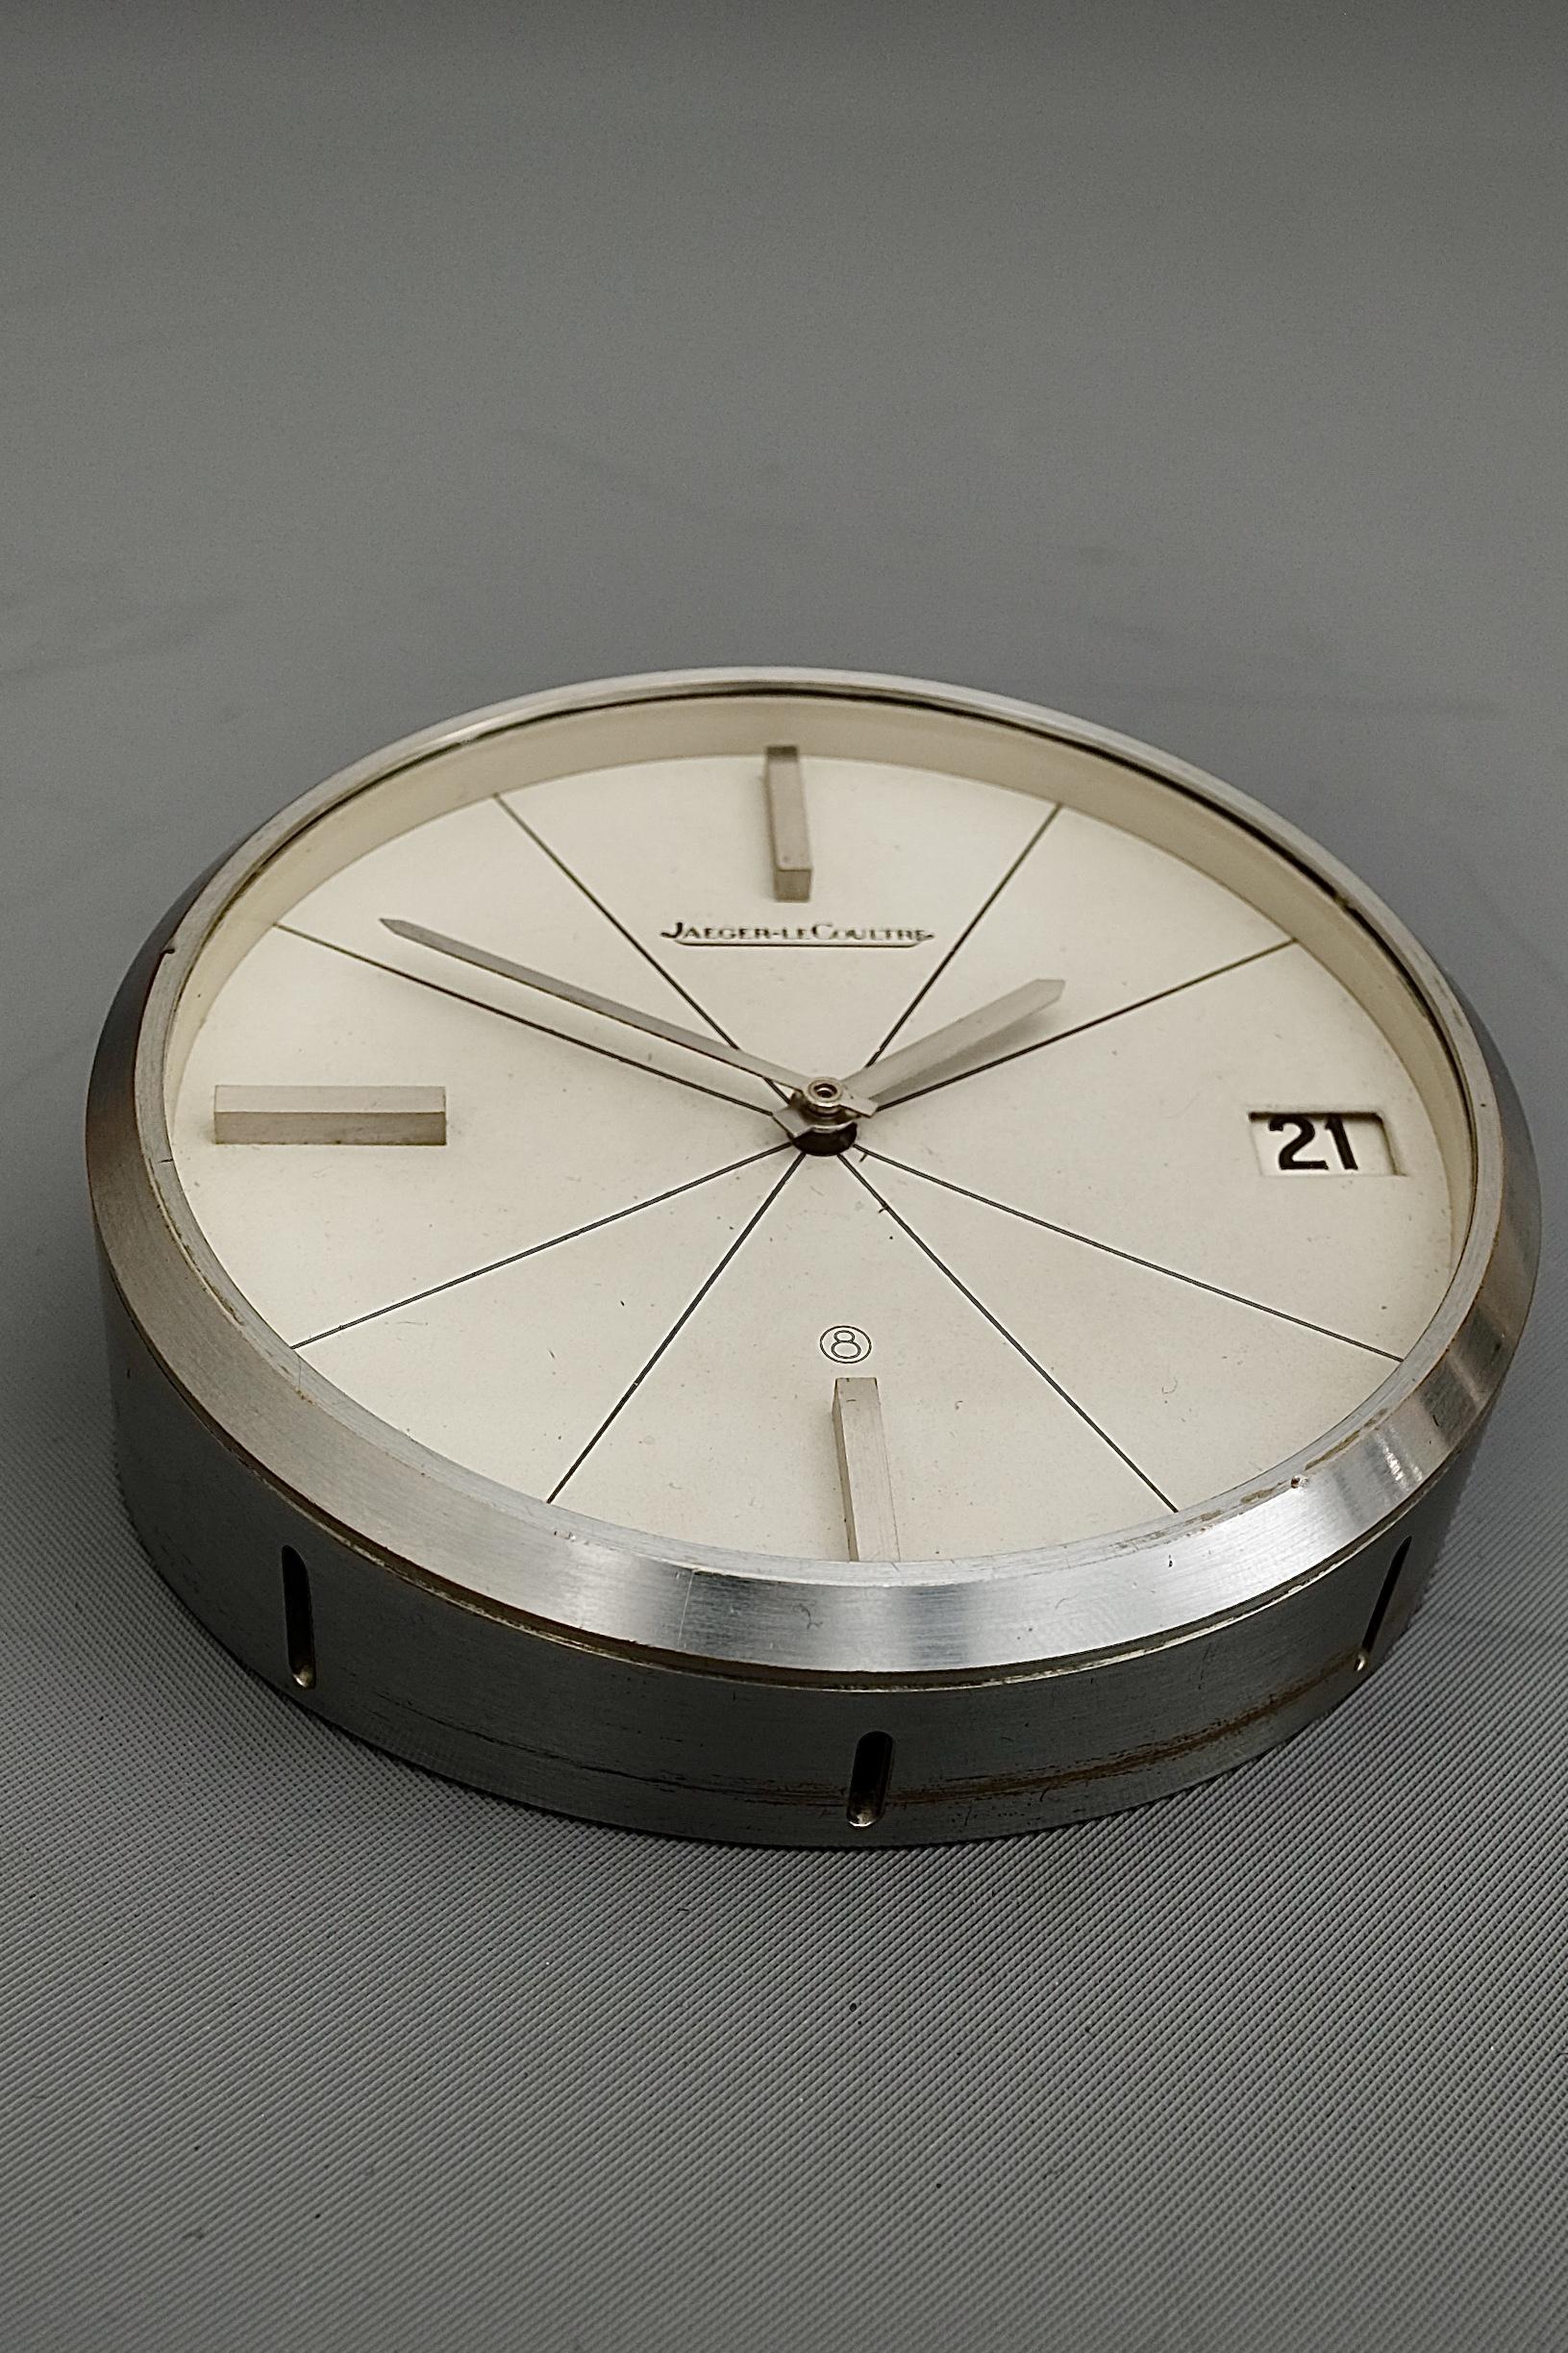 Jaeger LeCoultre Mid-Century Swiss Desk Clock